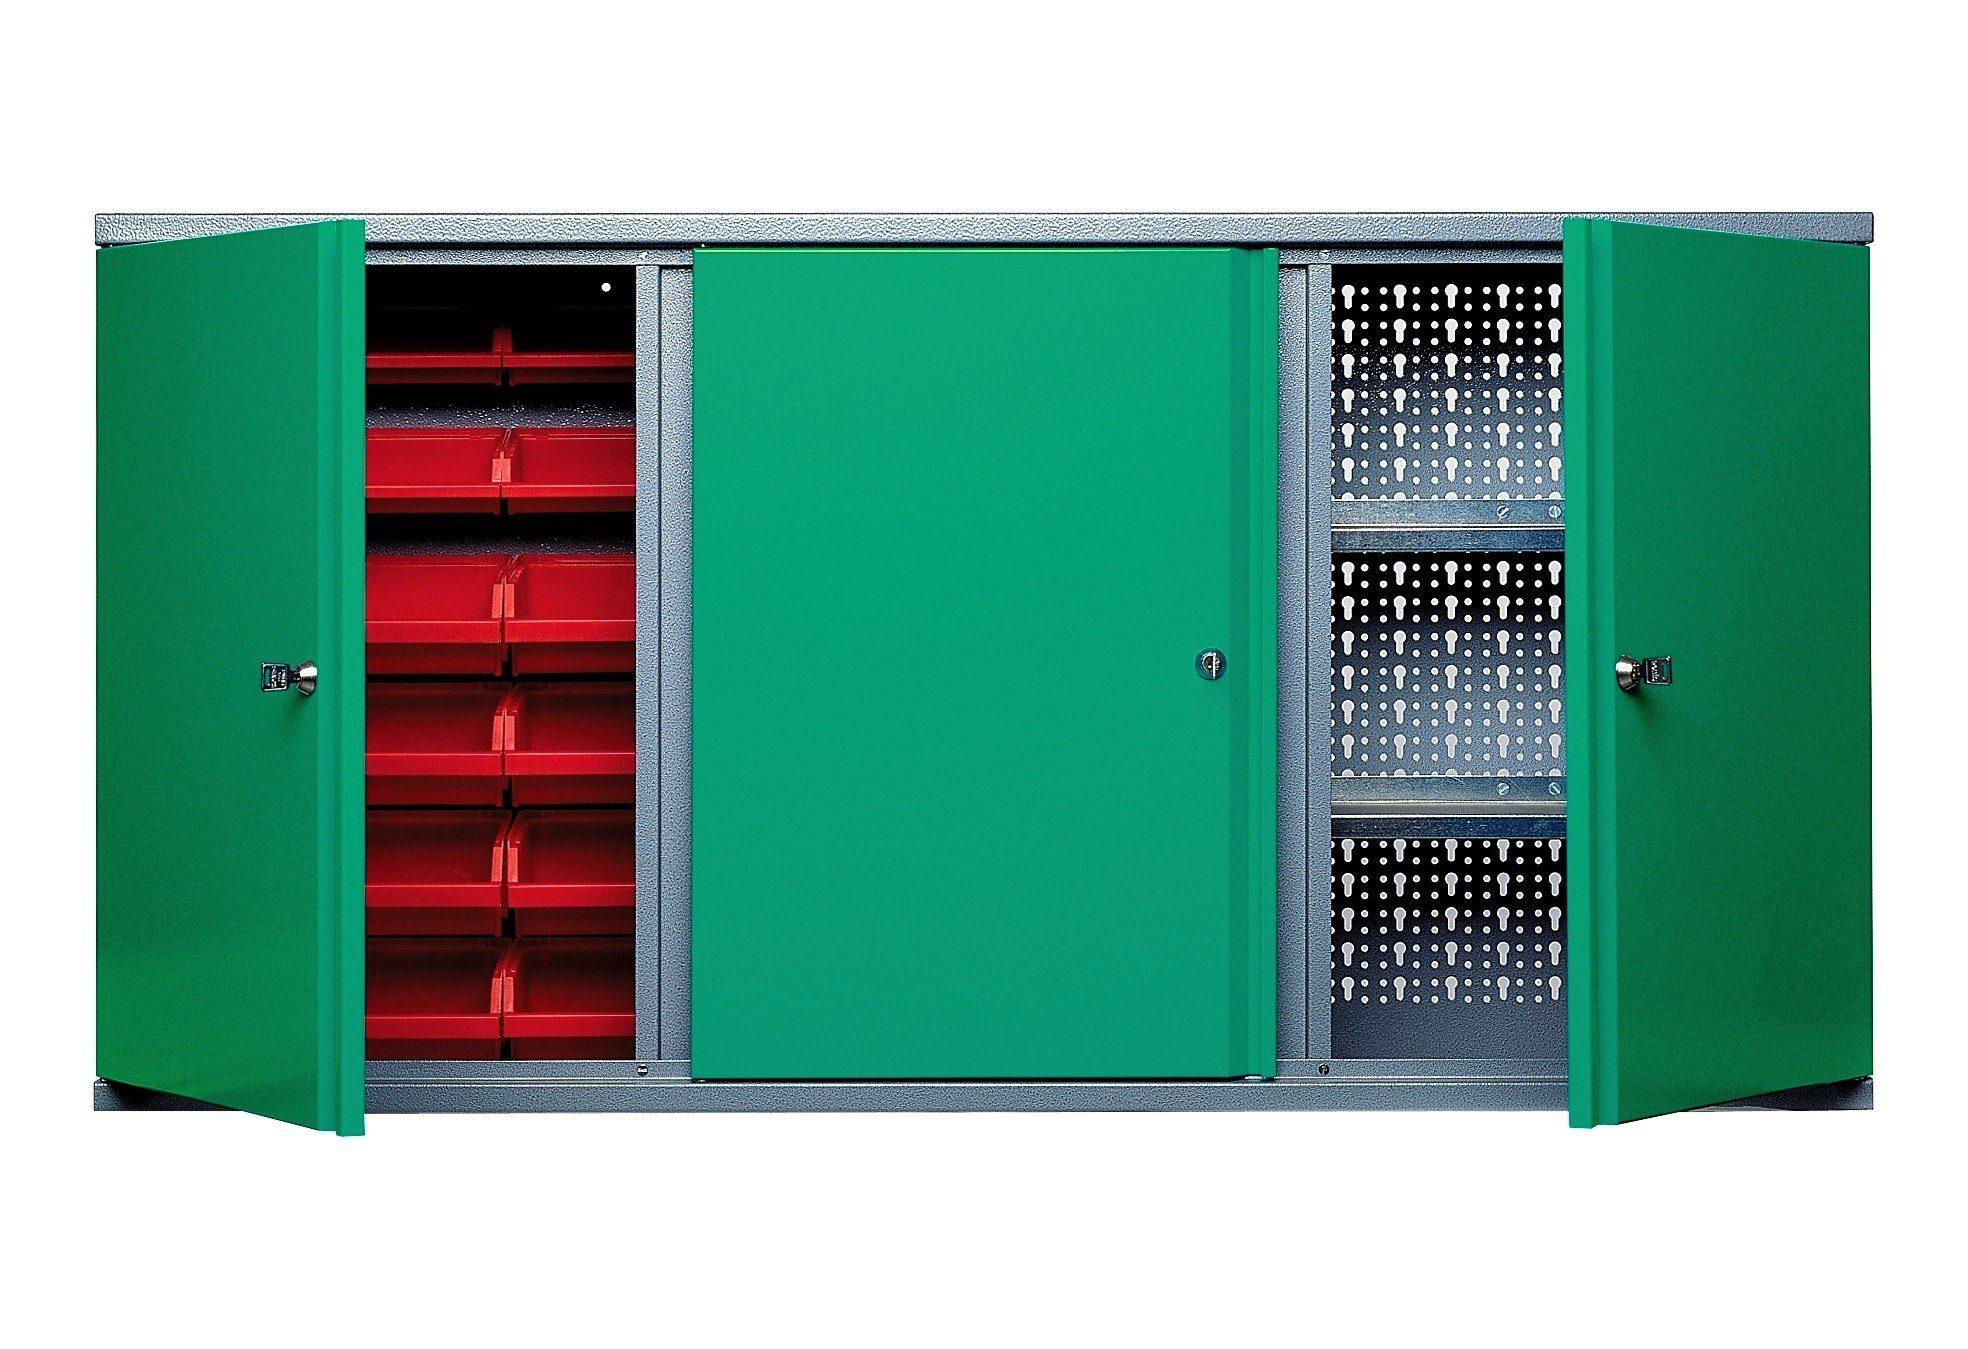 Küpper Hängeschrank »3 Türen, 5 Einlegeböden, in grün«